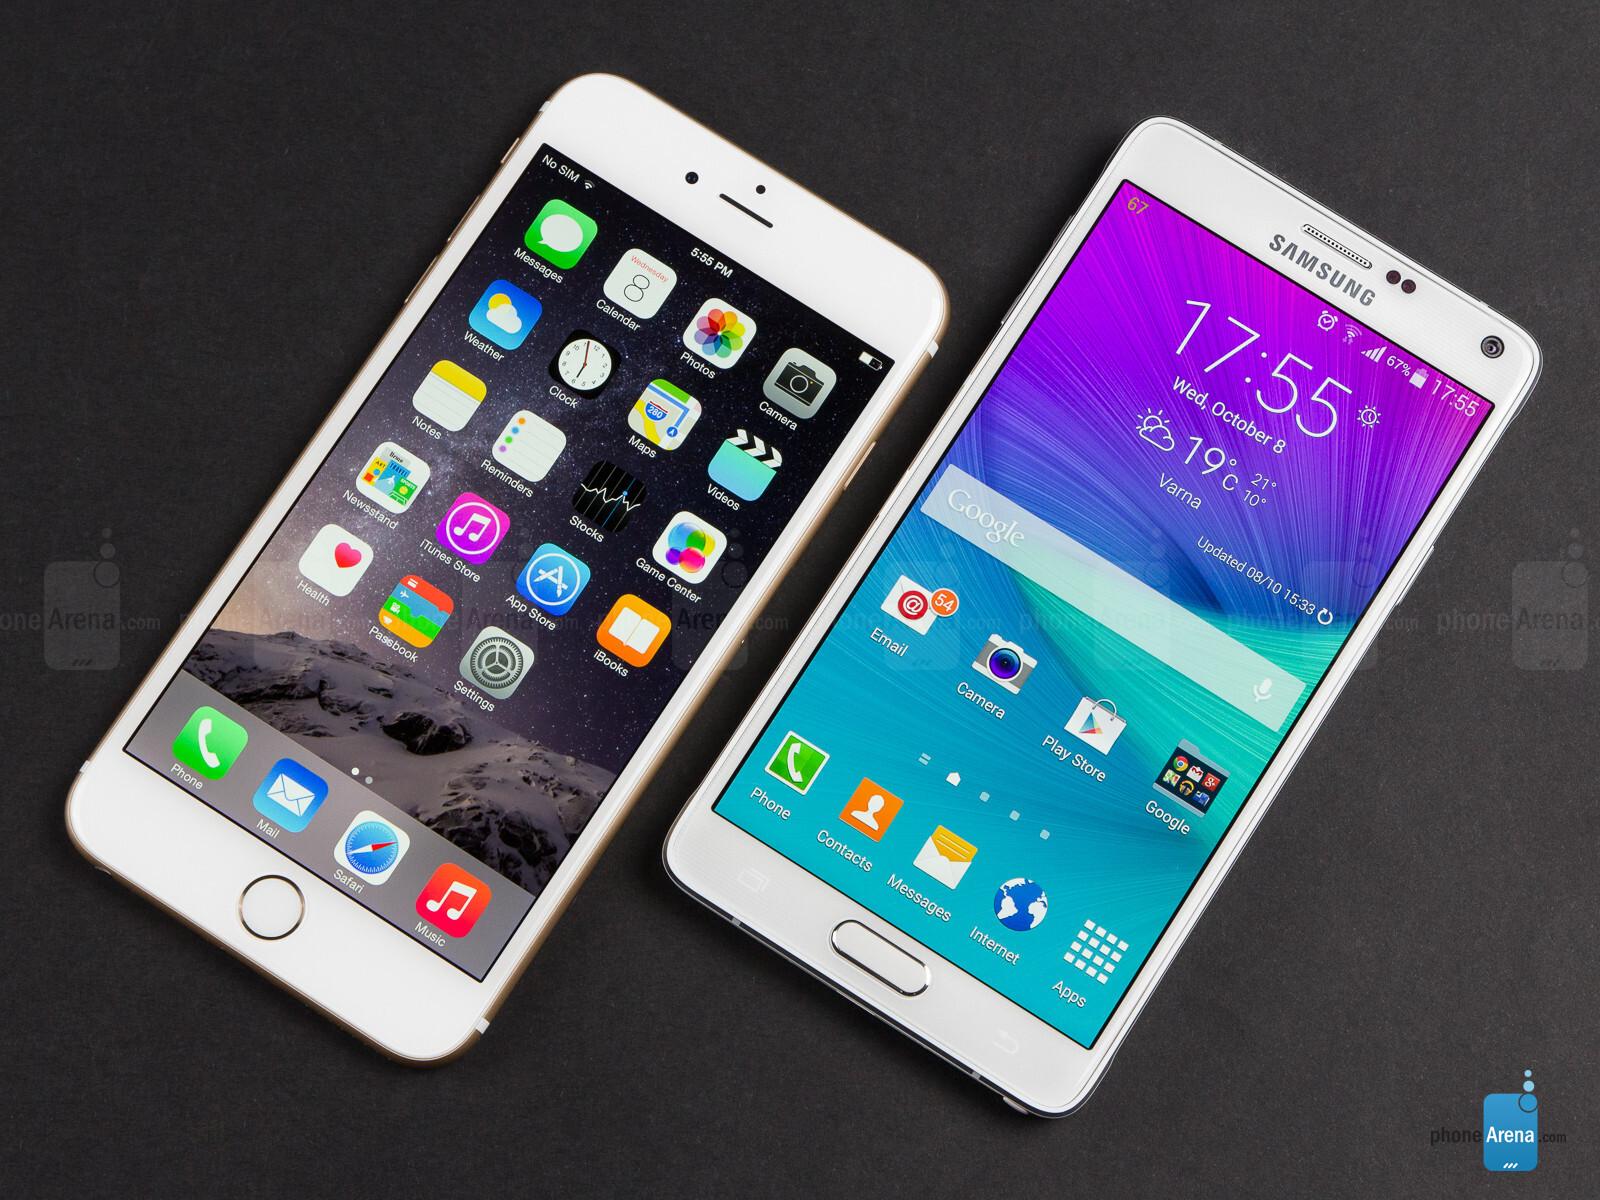 samsung note 4 vs iphone 6 plus